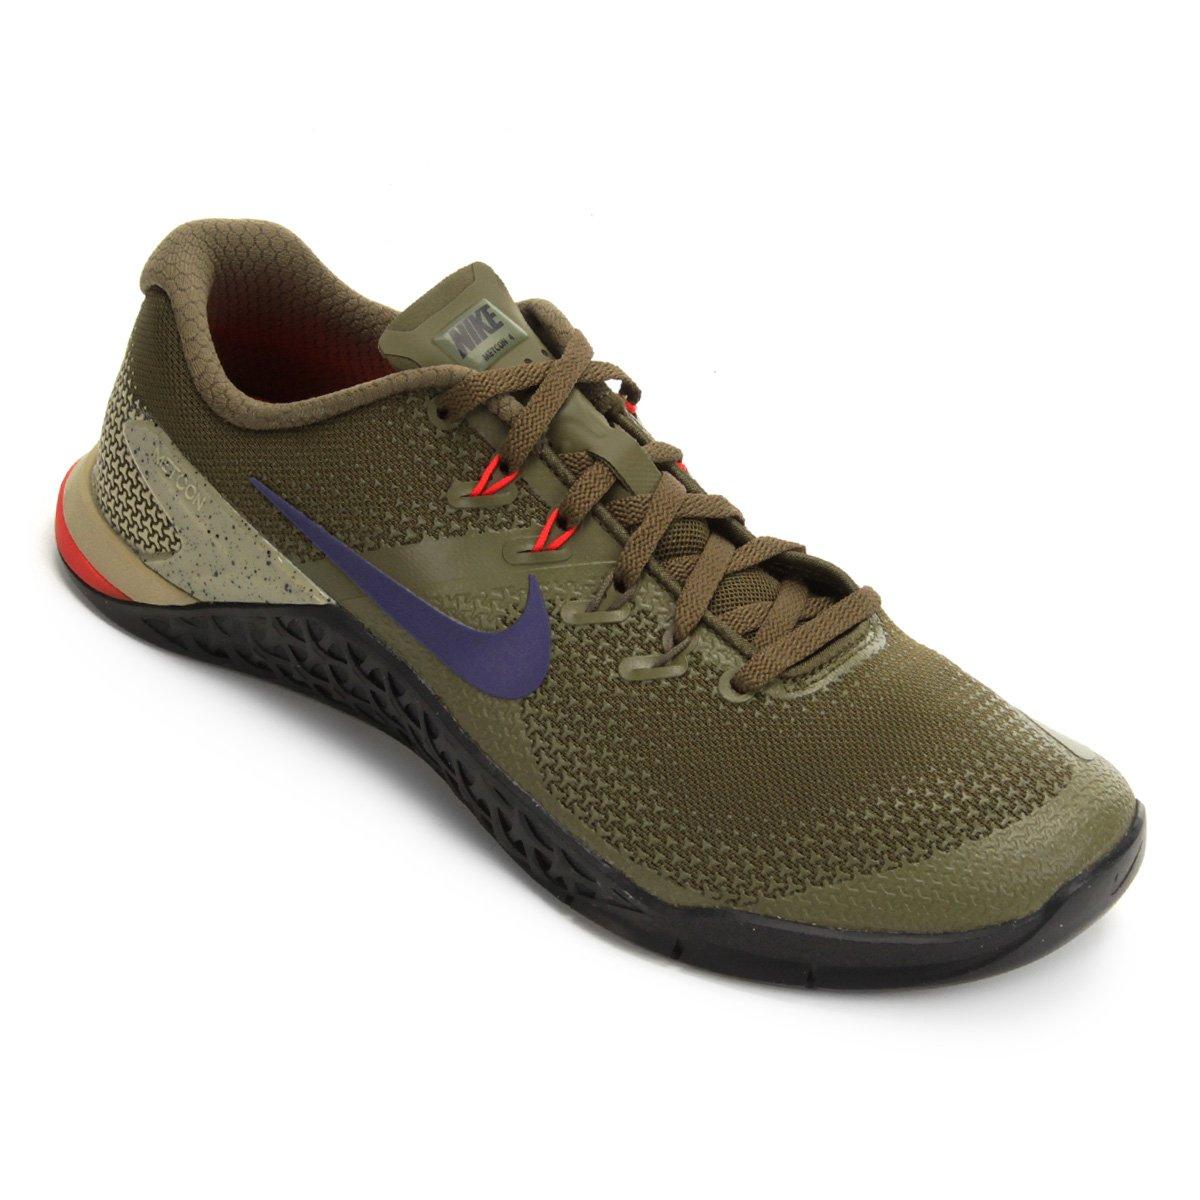 826887876 Tênis Nike Metcon 4 Masculino - Verde e Preto | Netshoes